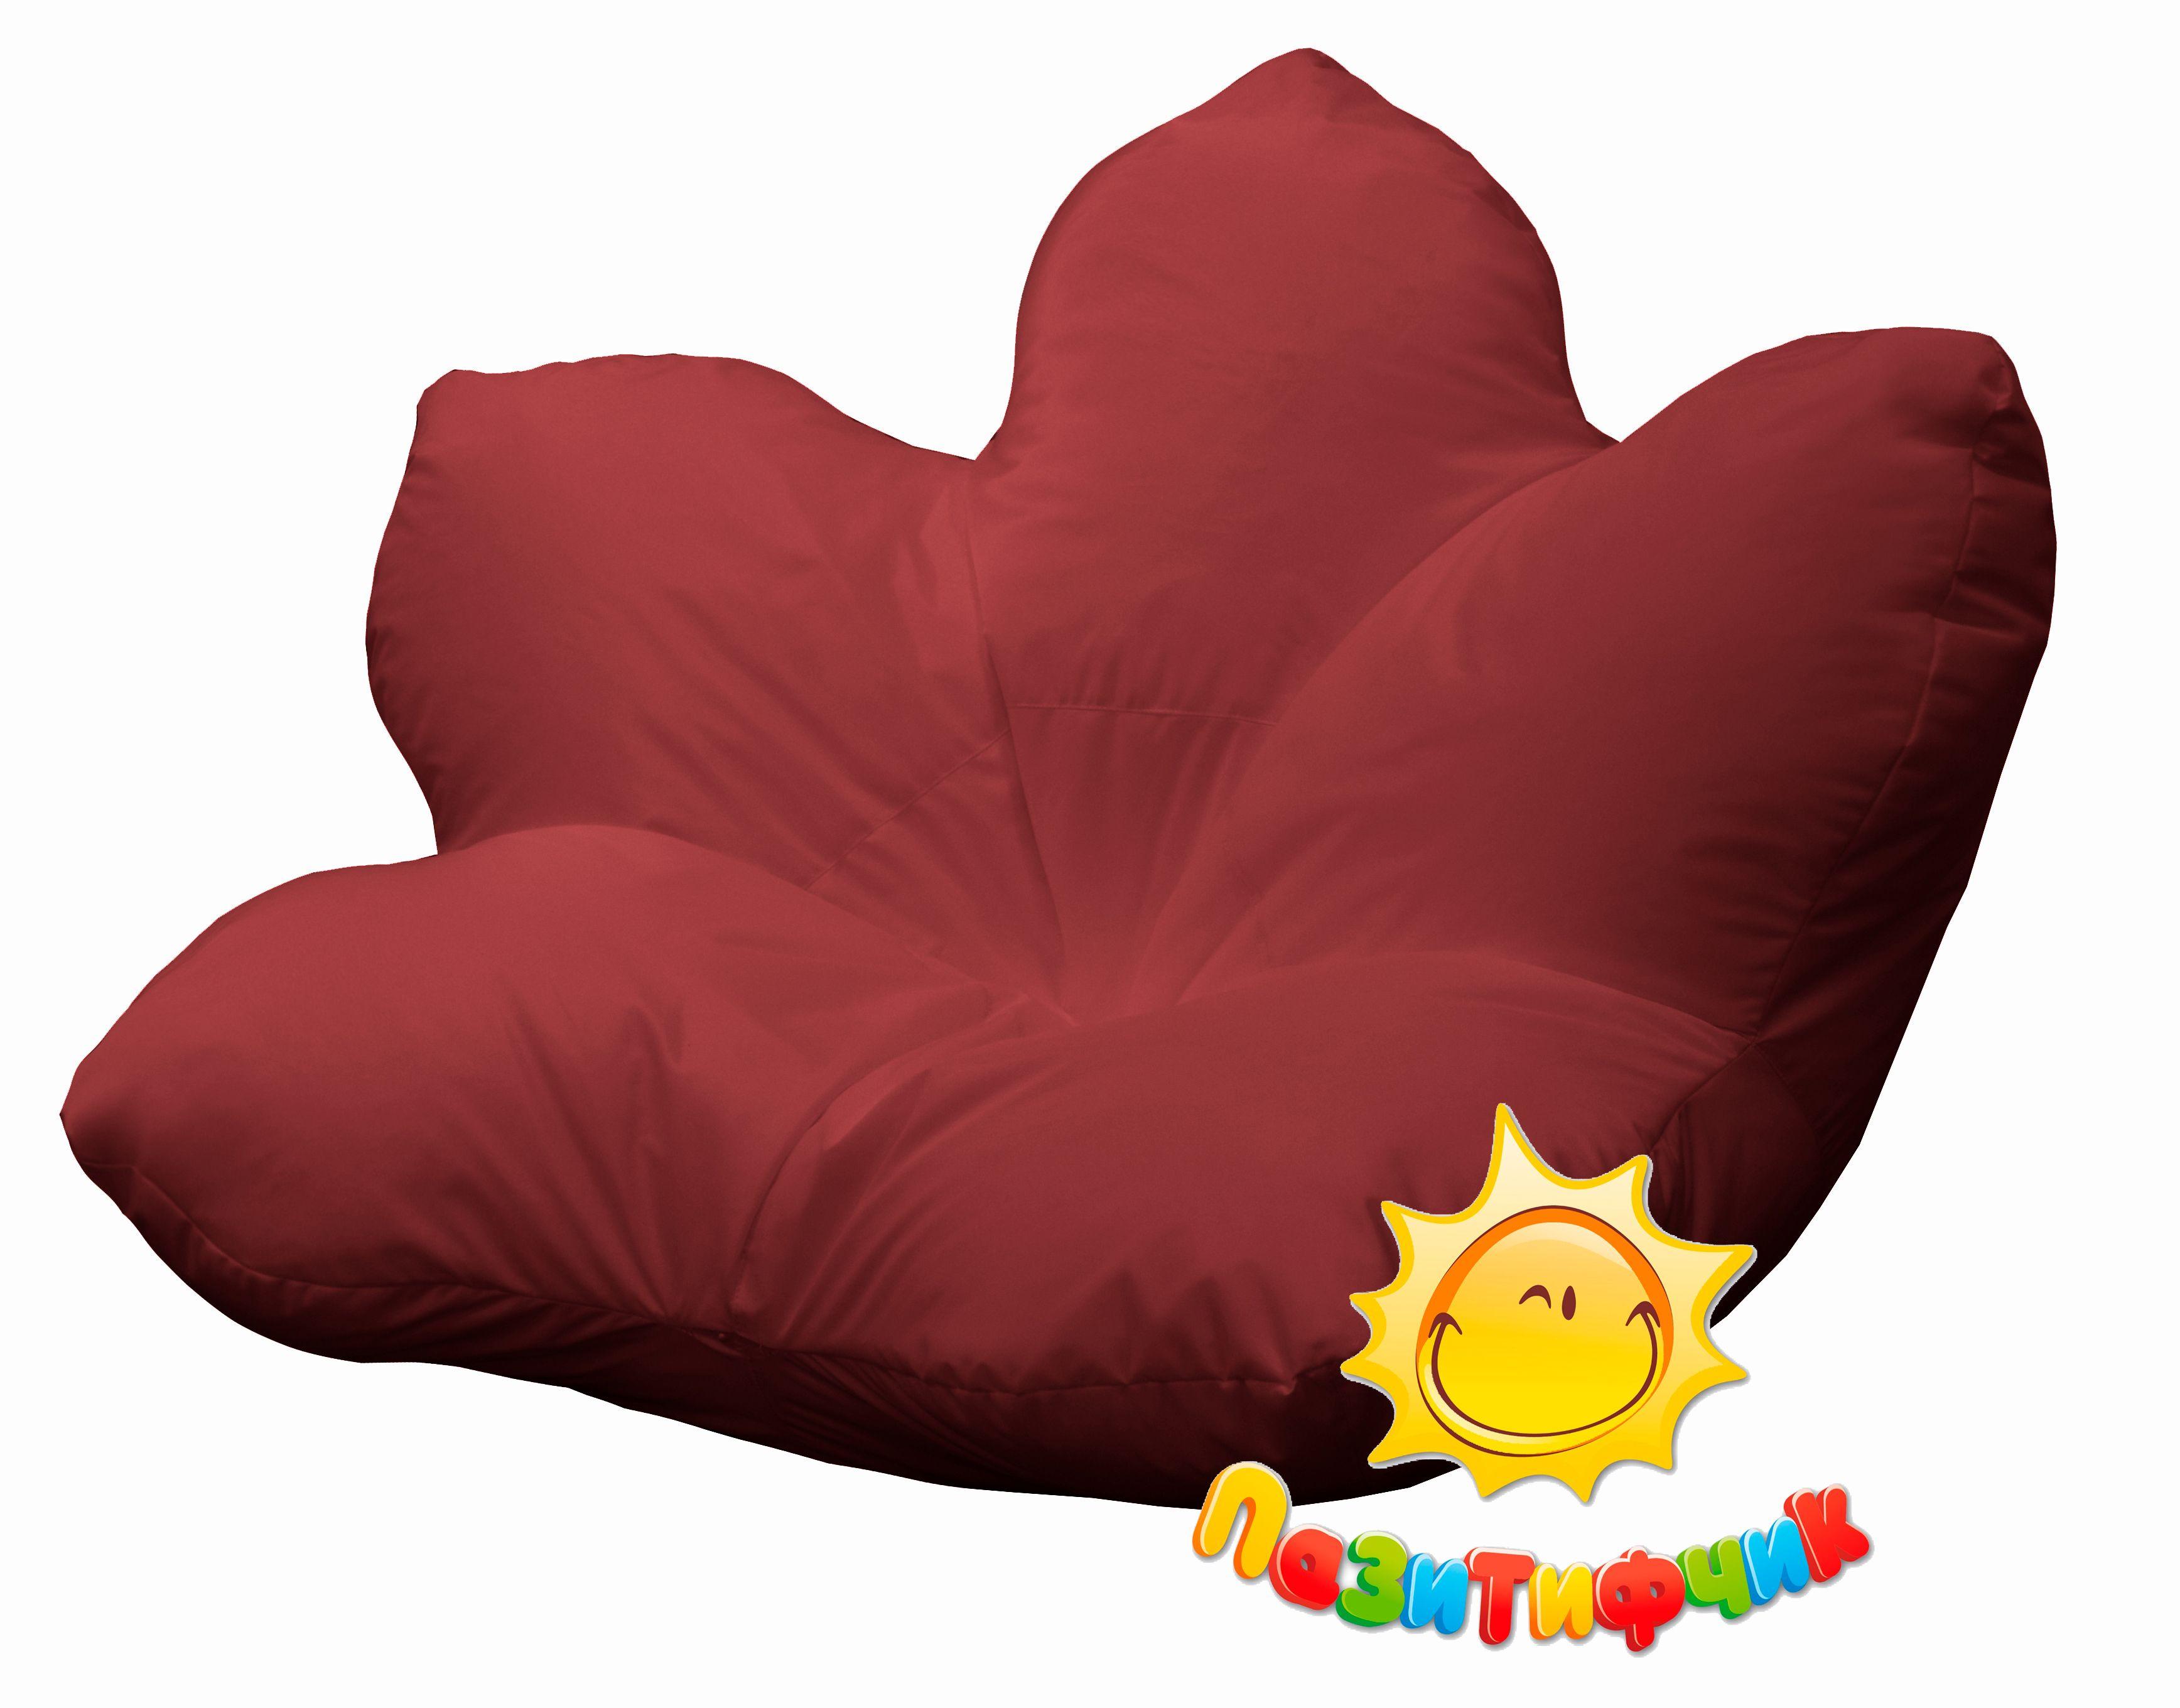 Кресло-мешок Pazitif Цветок Пазитифчик, размер XXXL, оксфорд, бордовый фото